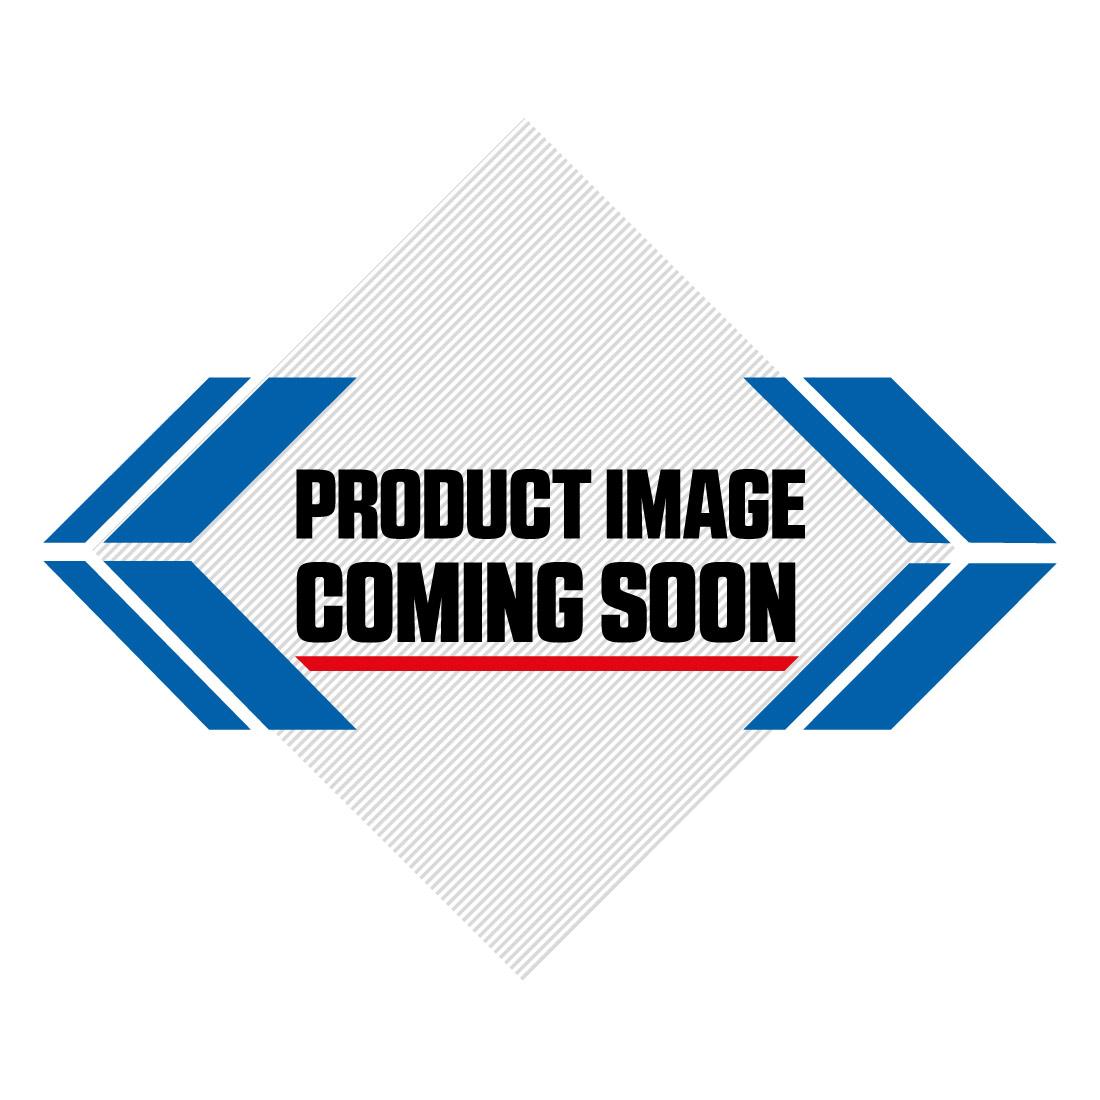 Suzuki Plastic Kit RMZ 450 (08-17) OEM Factory Image-0